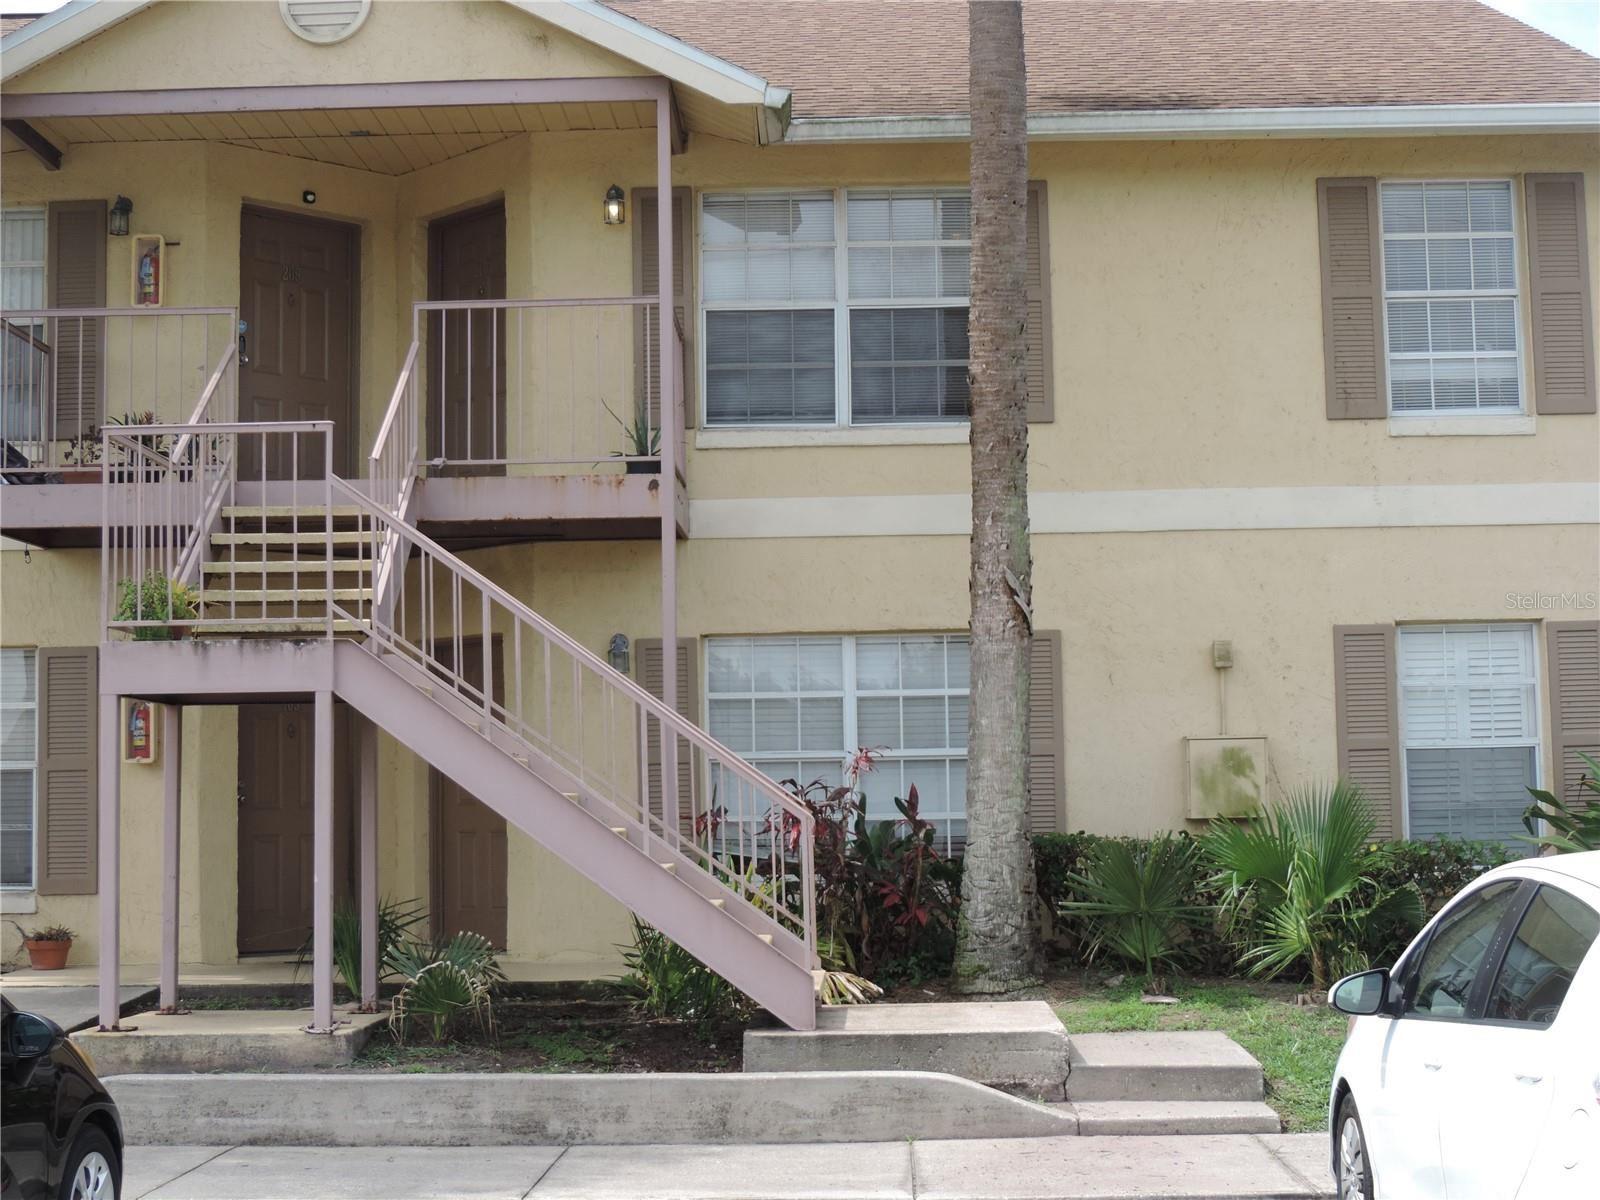 3651 N GOLDENROD ROAD #C210, Winter Park, FL 32792 - #: O5953544